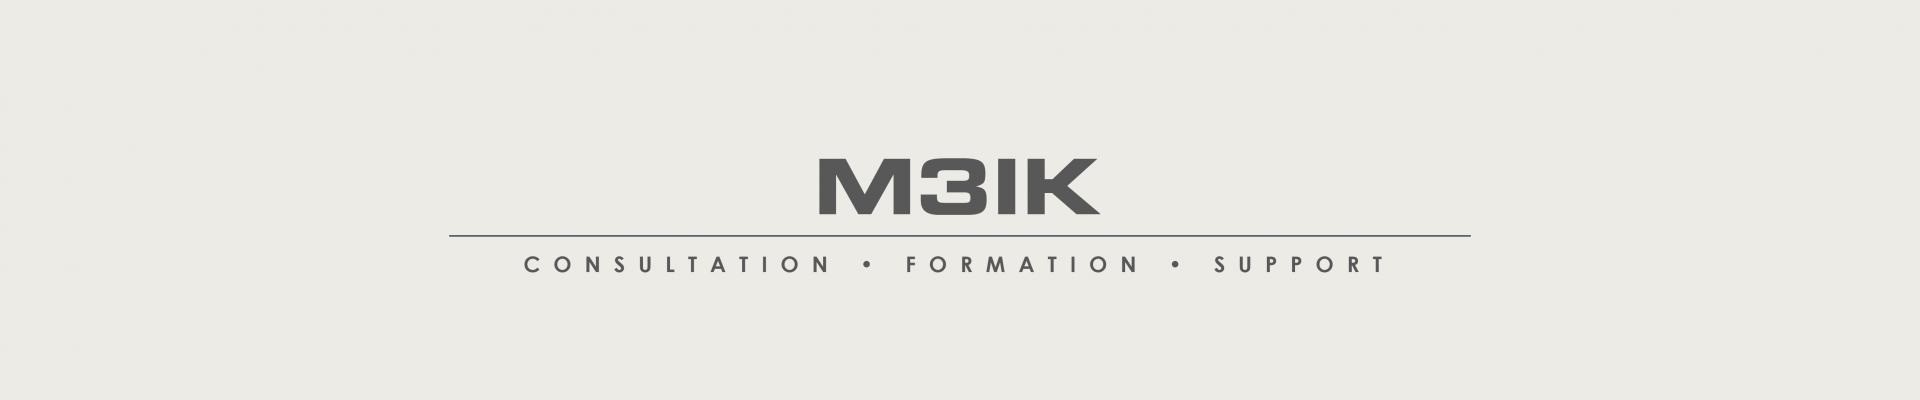 M3ik.com